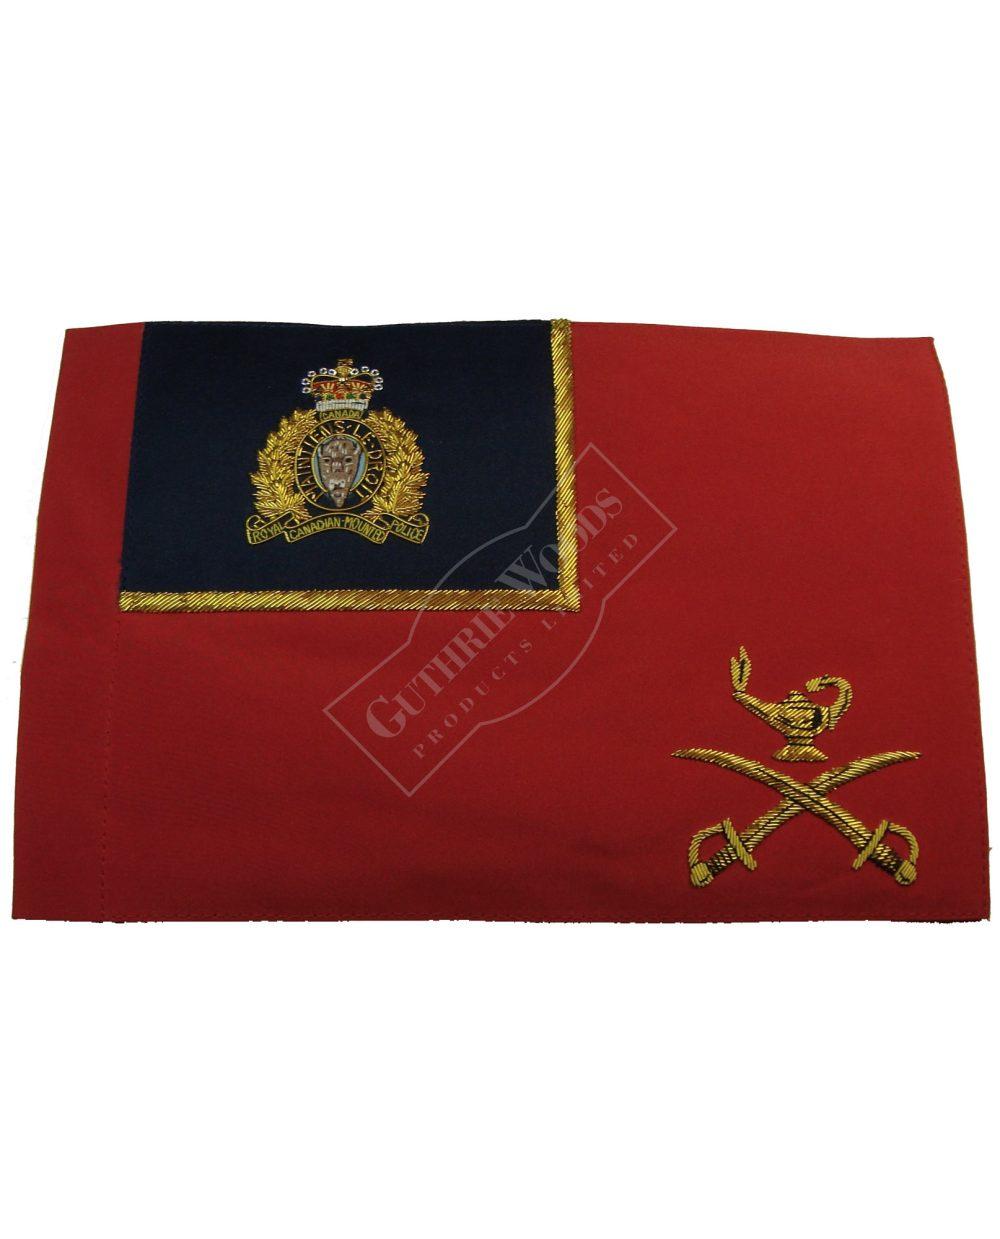 RCMP Miniature Division Ensign R173-DEPOT